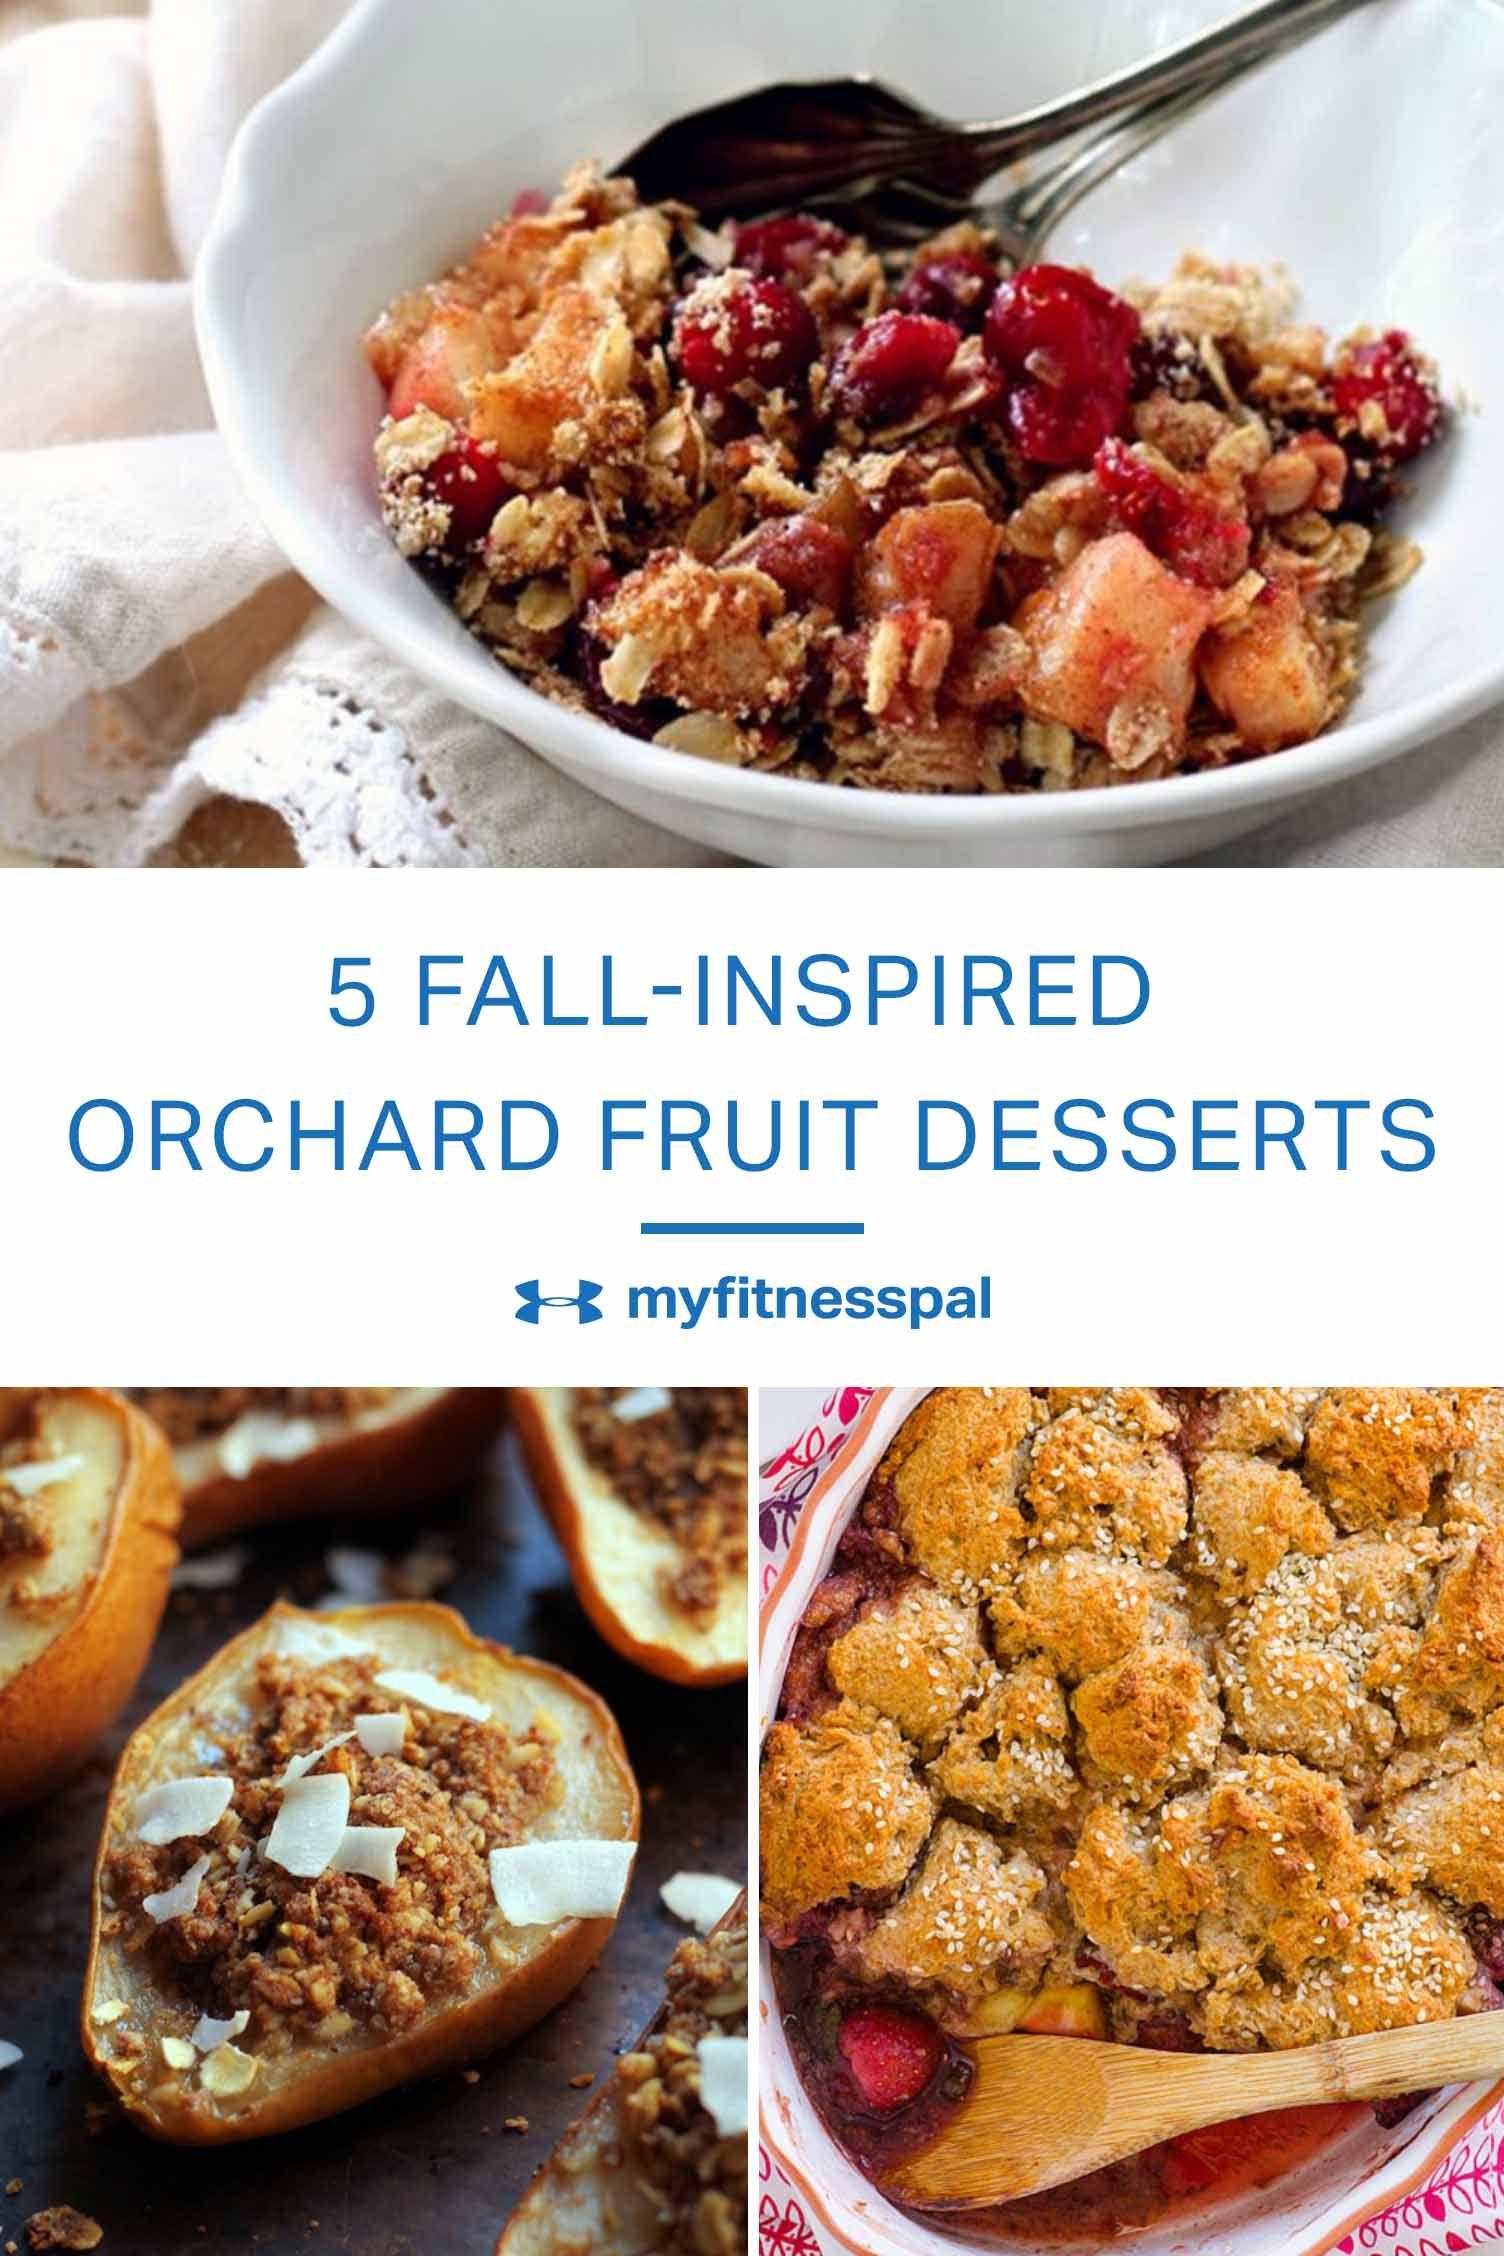 7 FallInspired Orchard Fruit Desserts Under 300 Calories